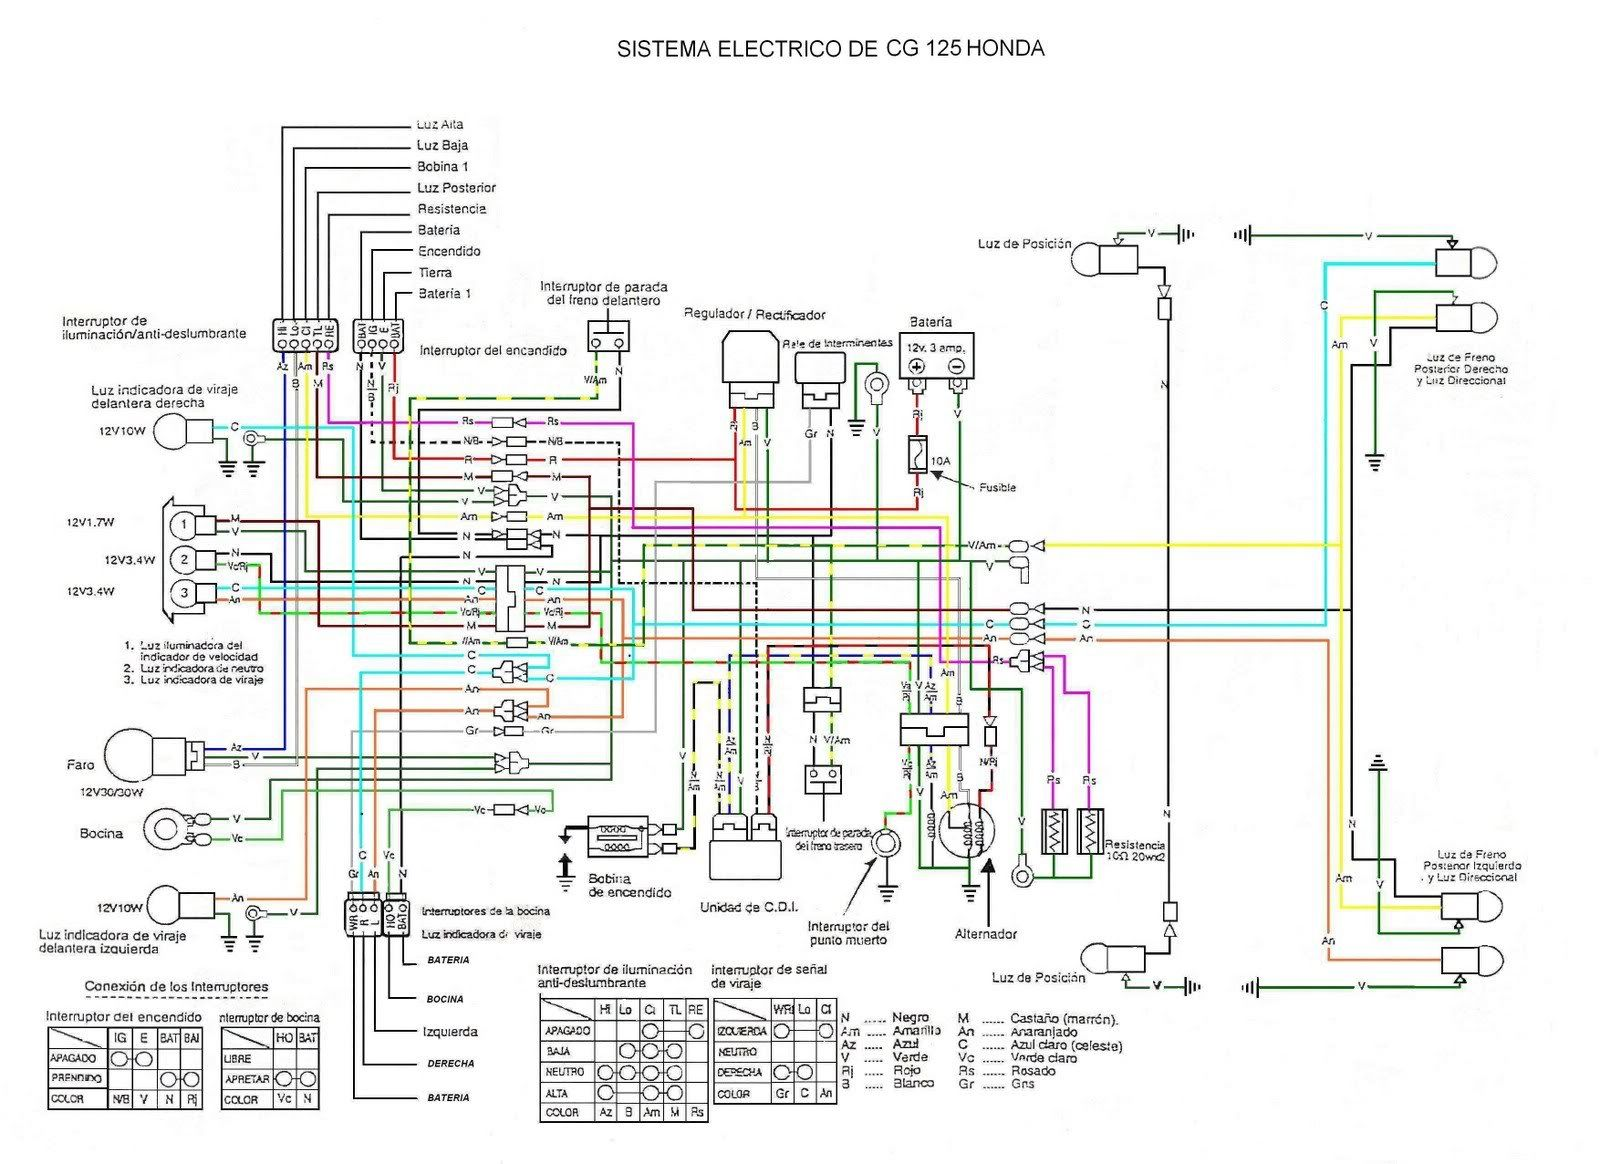 Diagrama o sistema eléctrico de motos chinas | wason  | Honda 125, Honda cg125 y Electrical